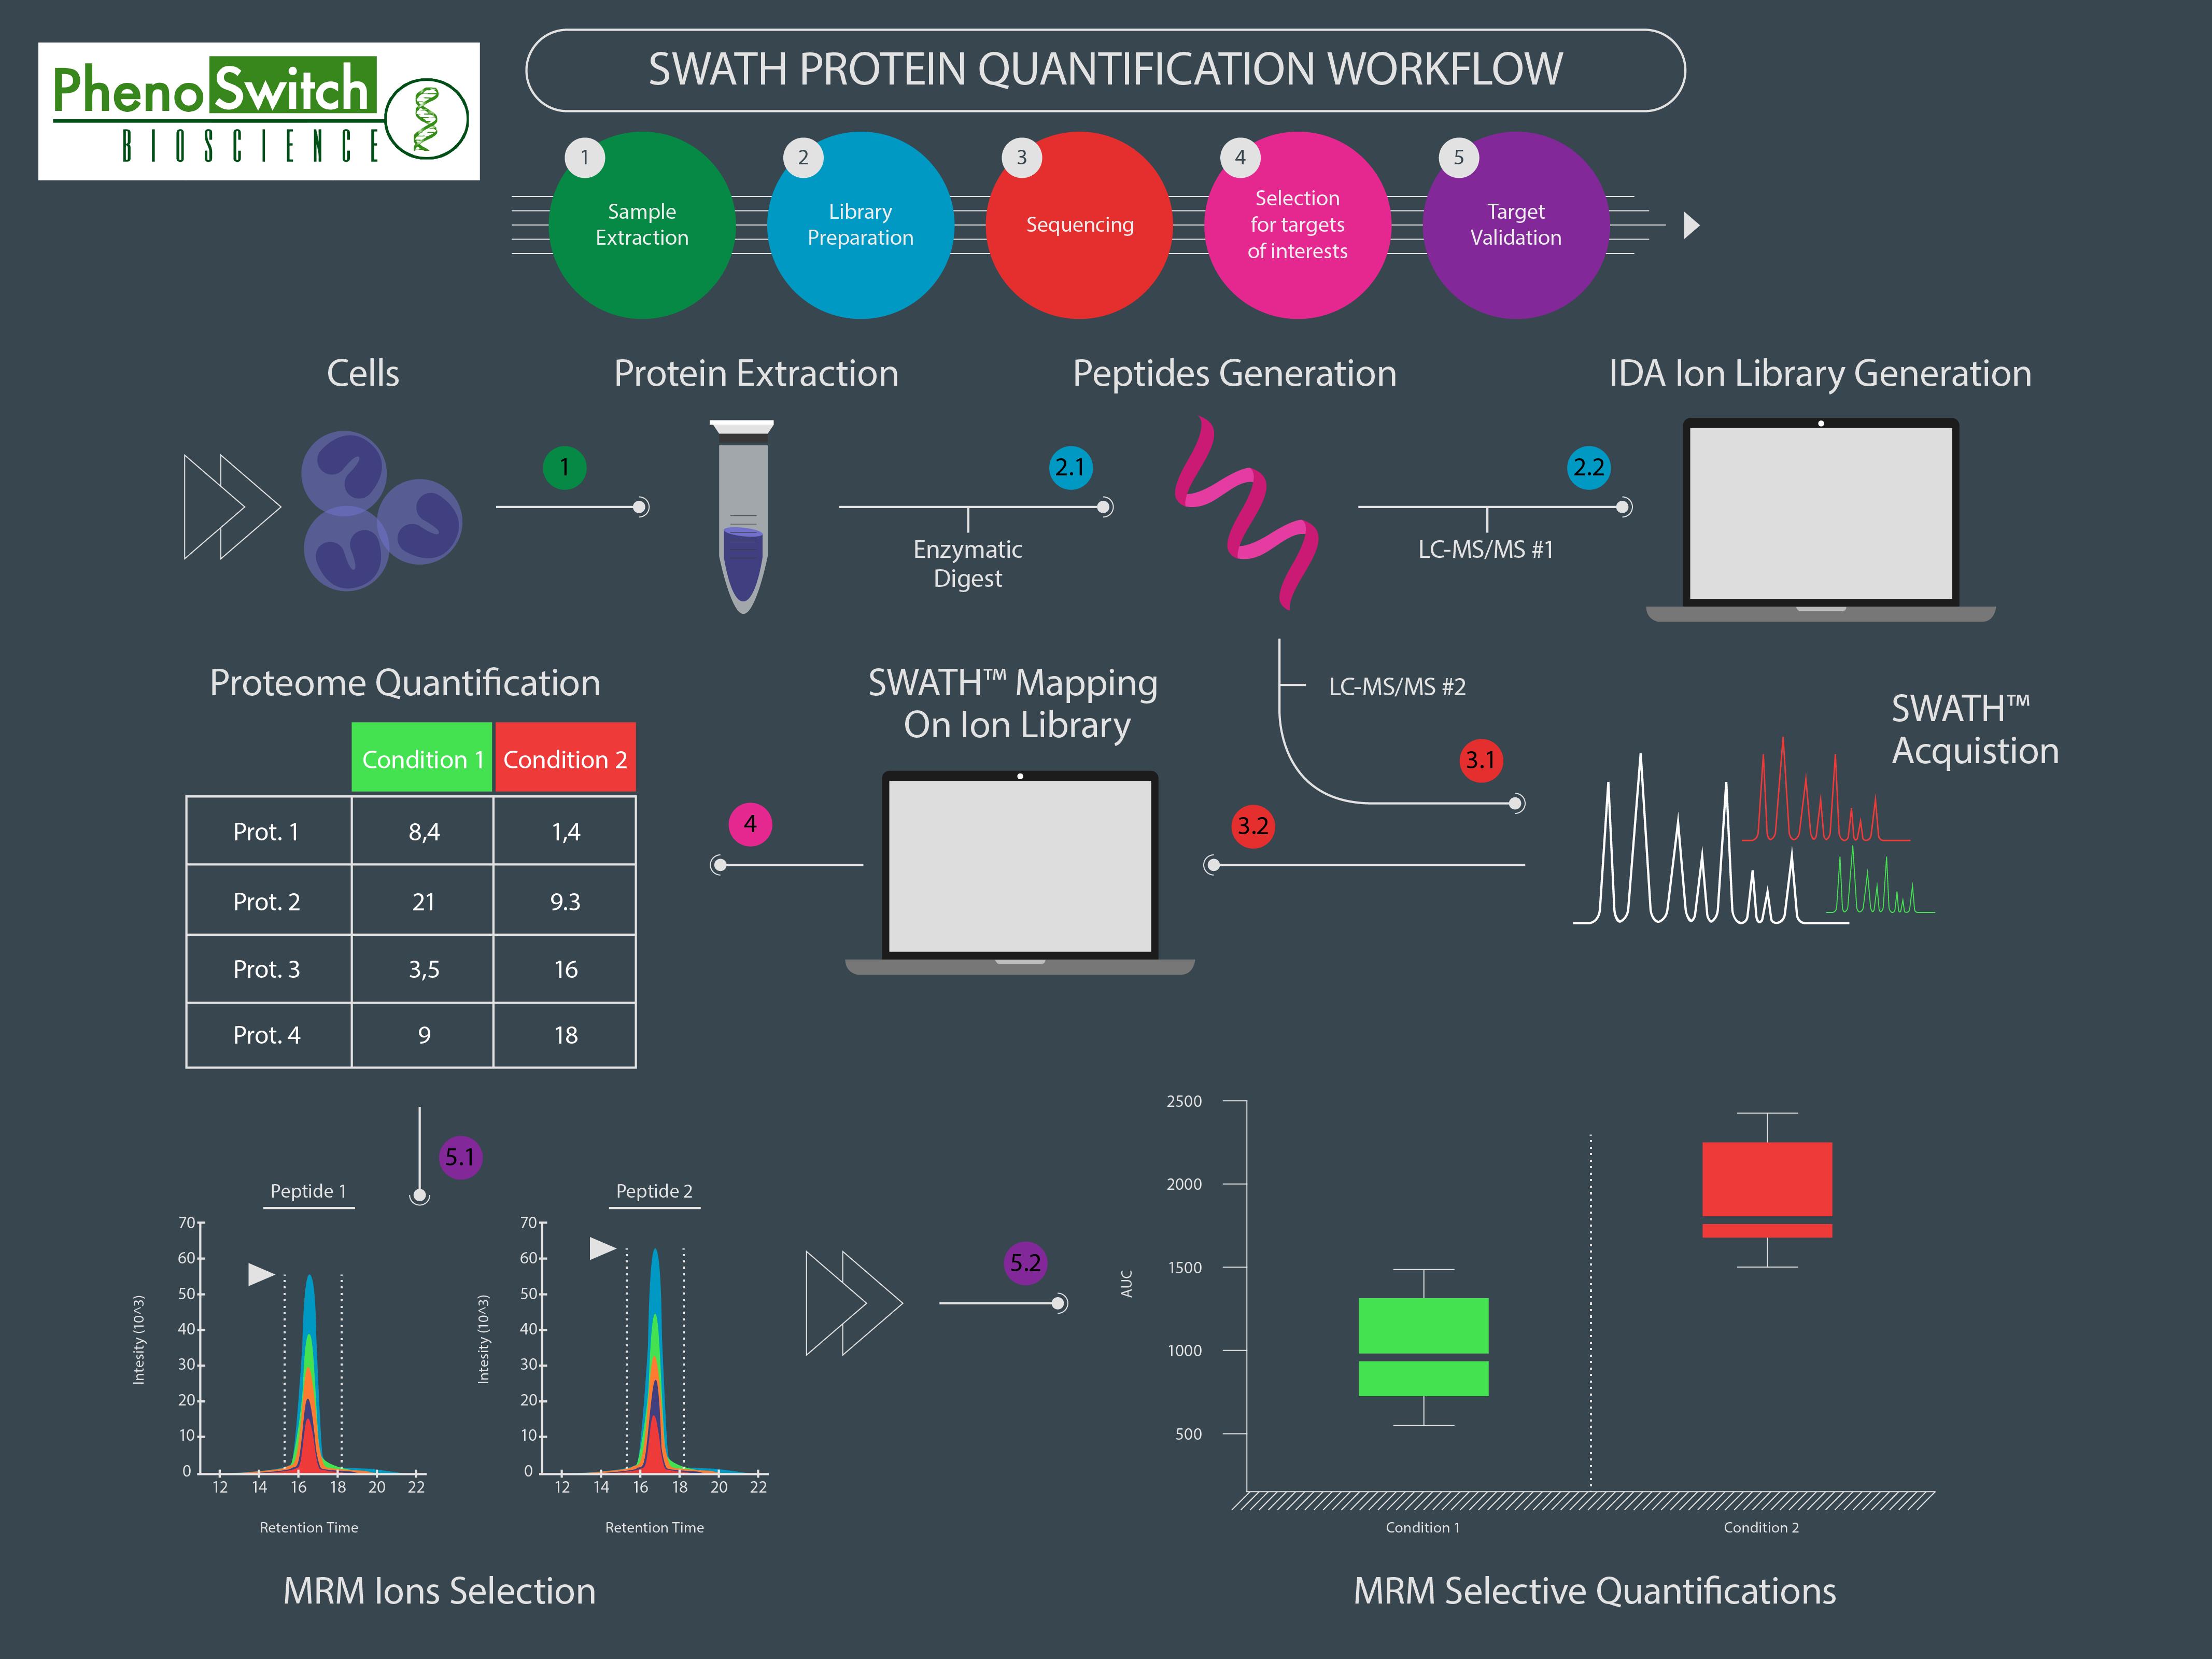 SWATH Proteomics workflow